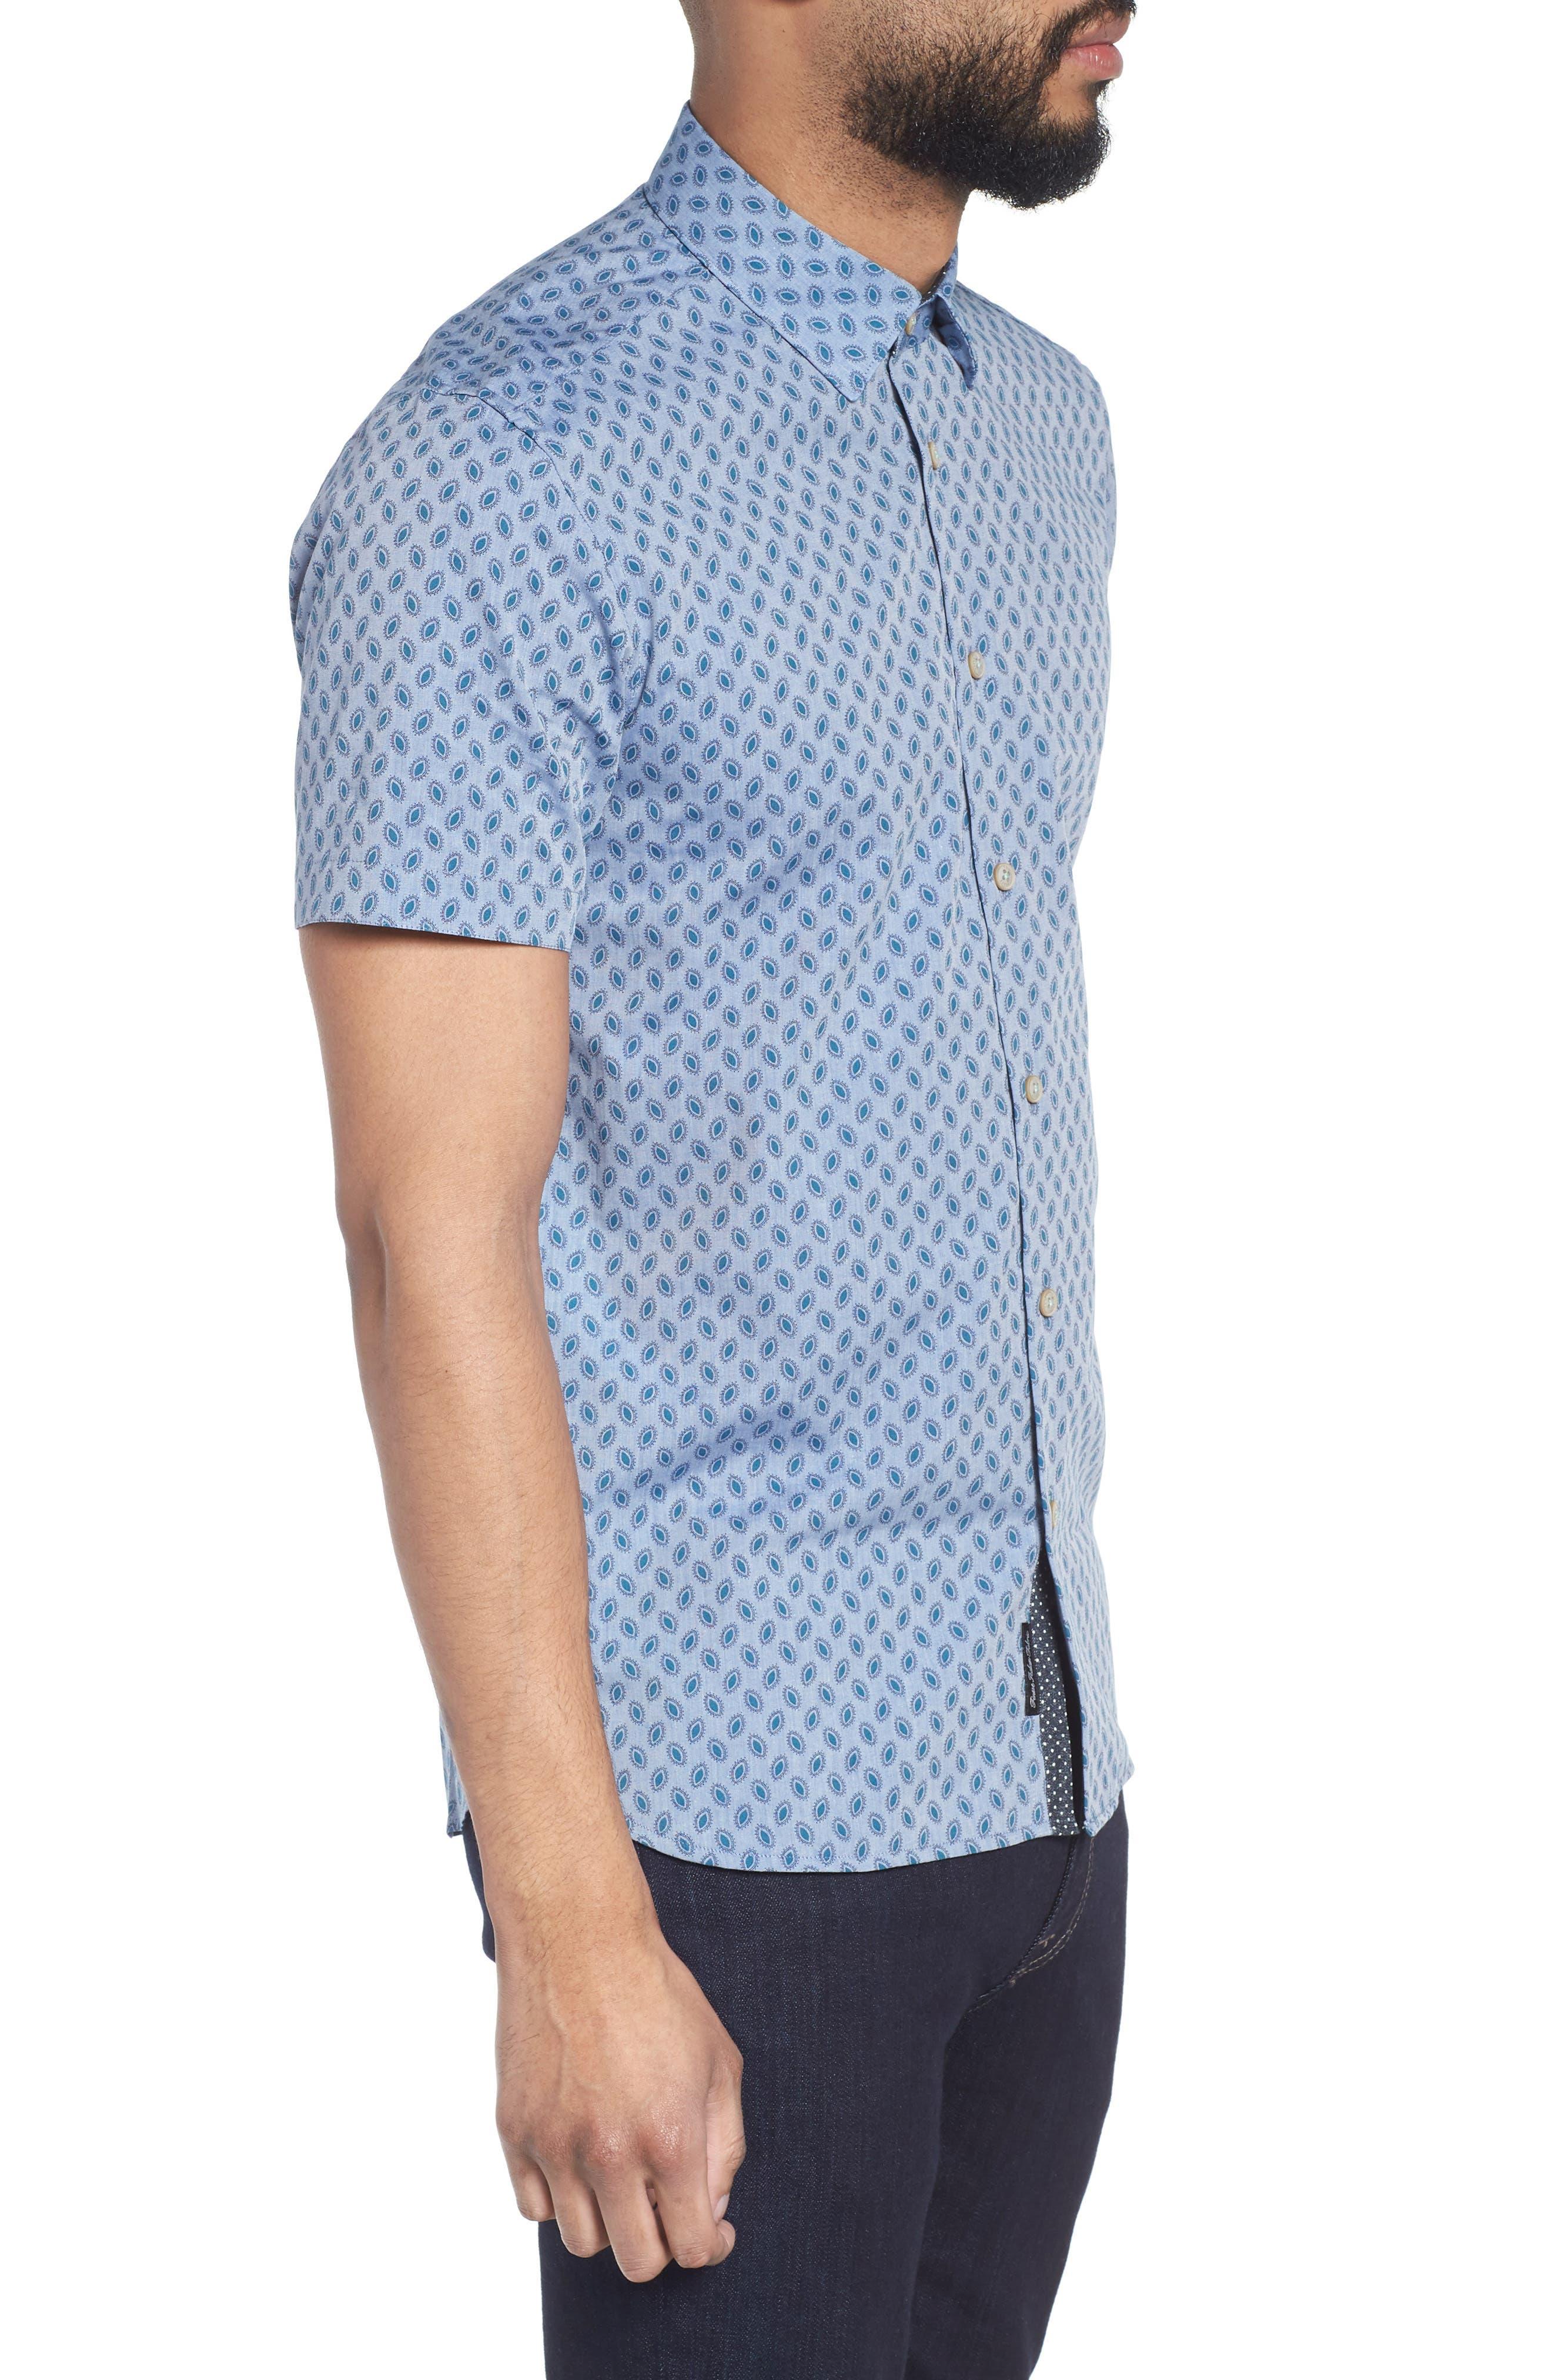 Newfott Extra Slim Fit Short Sleeve Sport Shirt,                             Alternate thumbnail 4, color,                             Blue